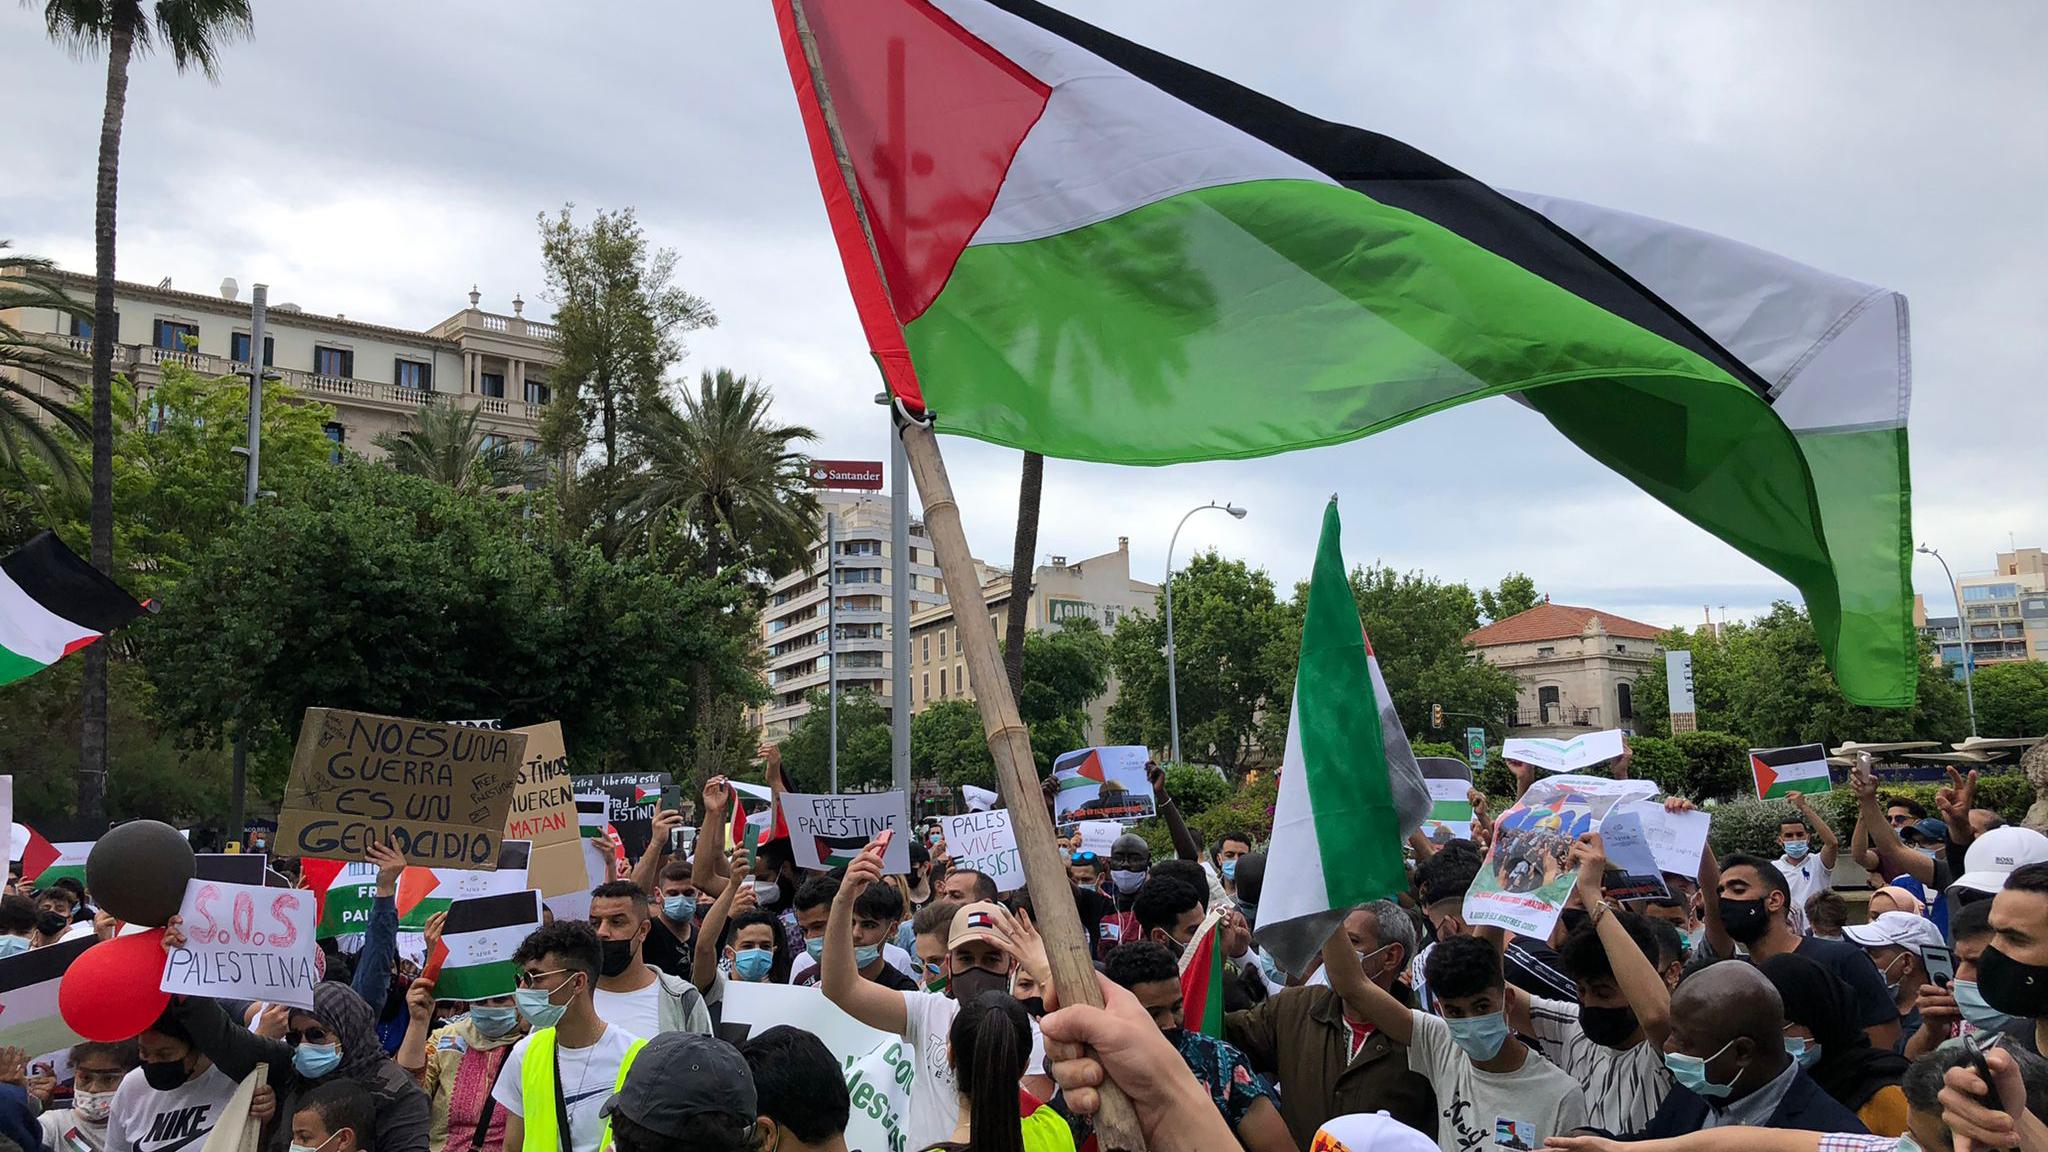 Manifestaci%C3%B3+a+Palma+a+favor+del+poble+palest%C3%AD